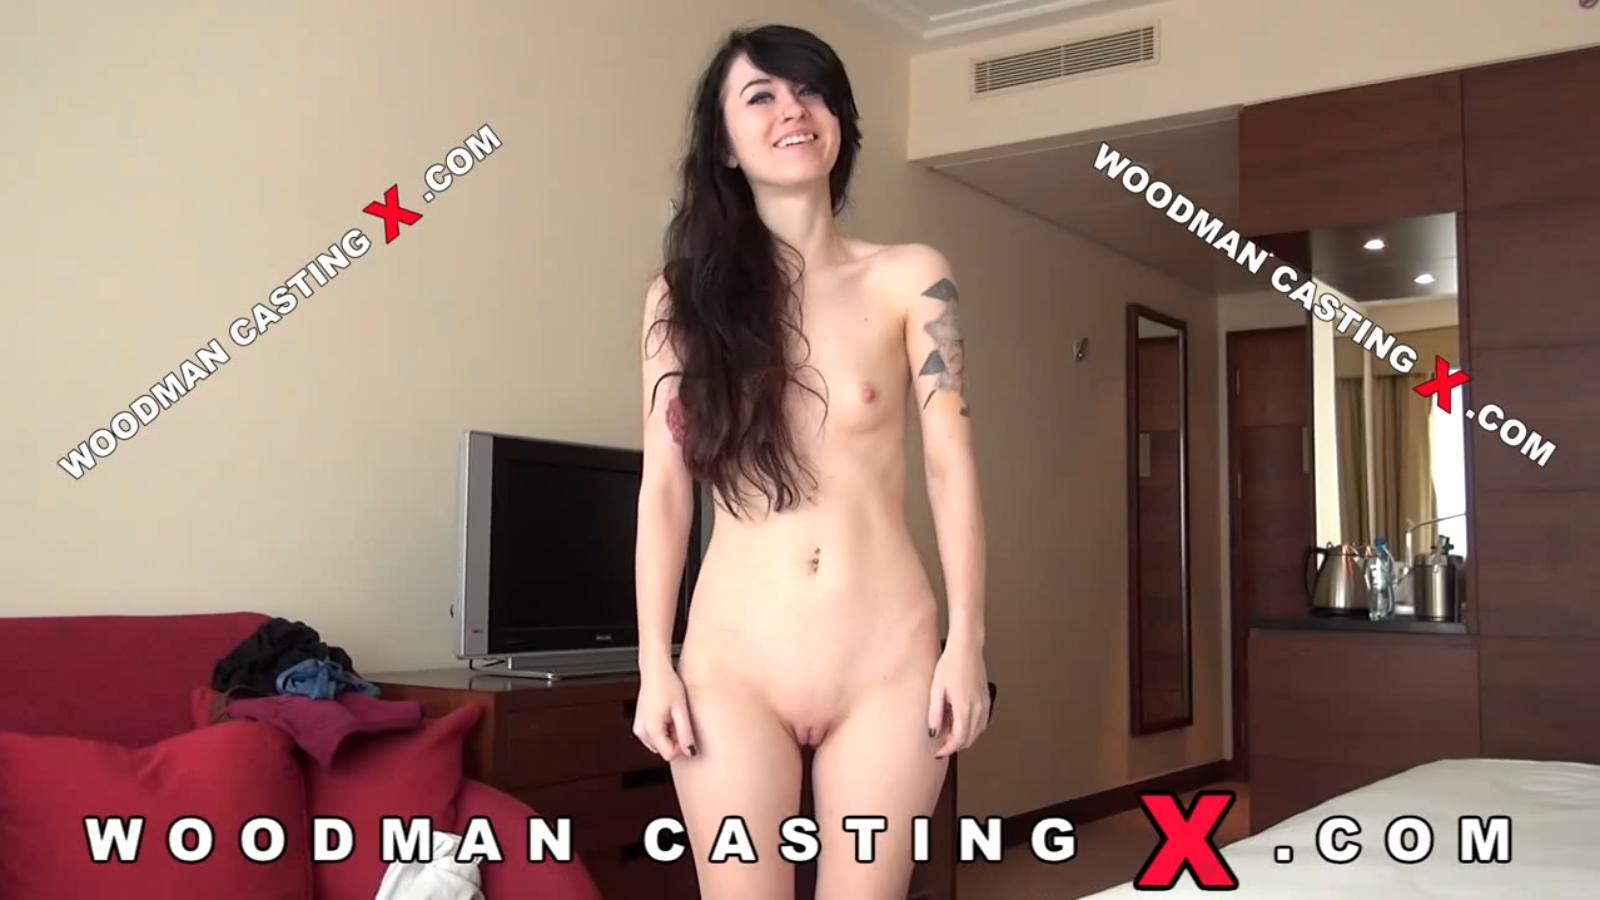 Victoria Puppy Misha Cross Hard Bed Woodman Casting